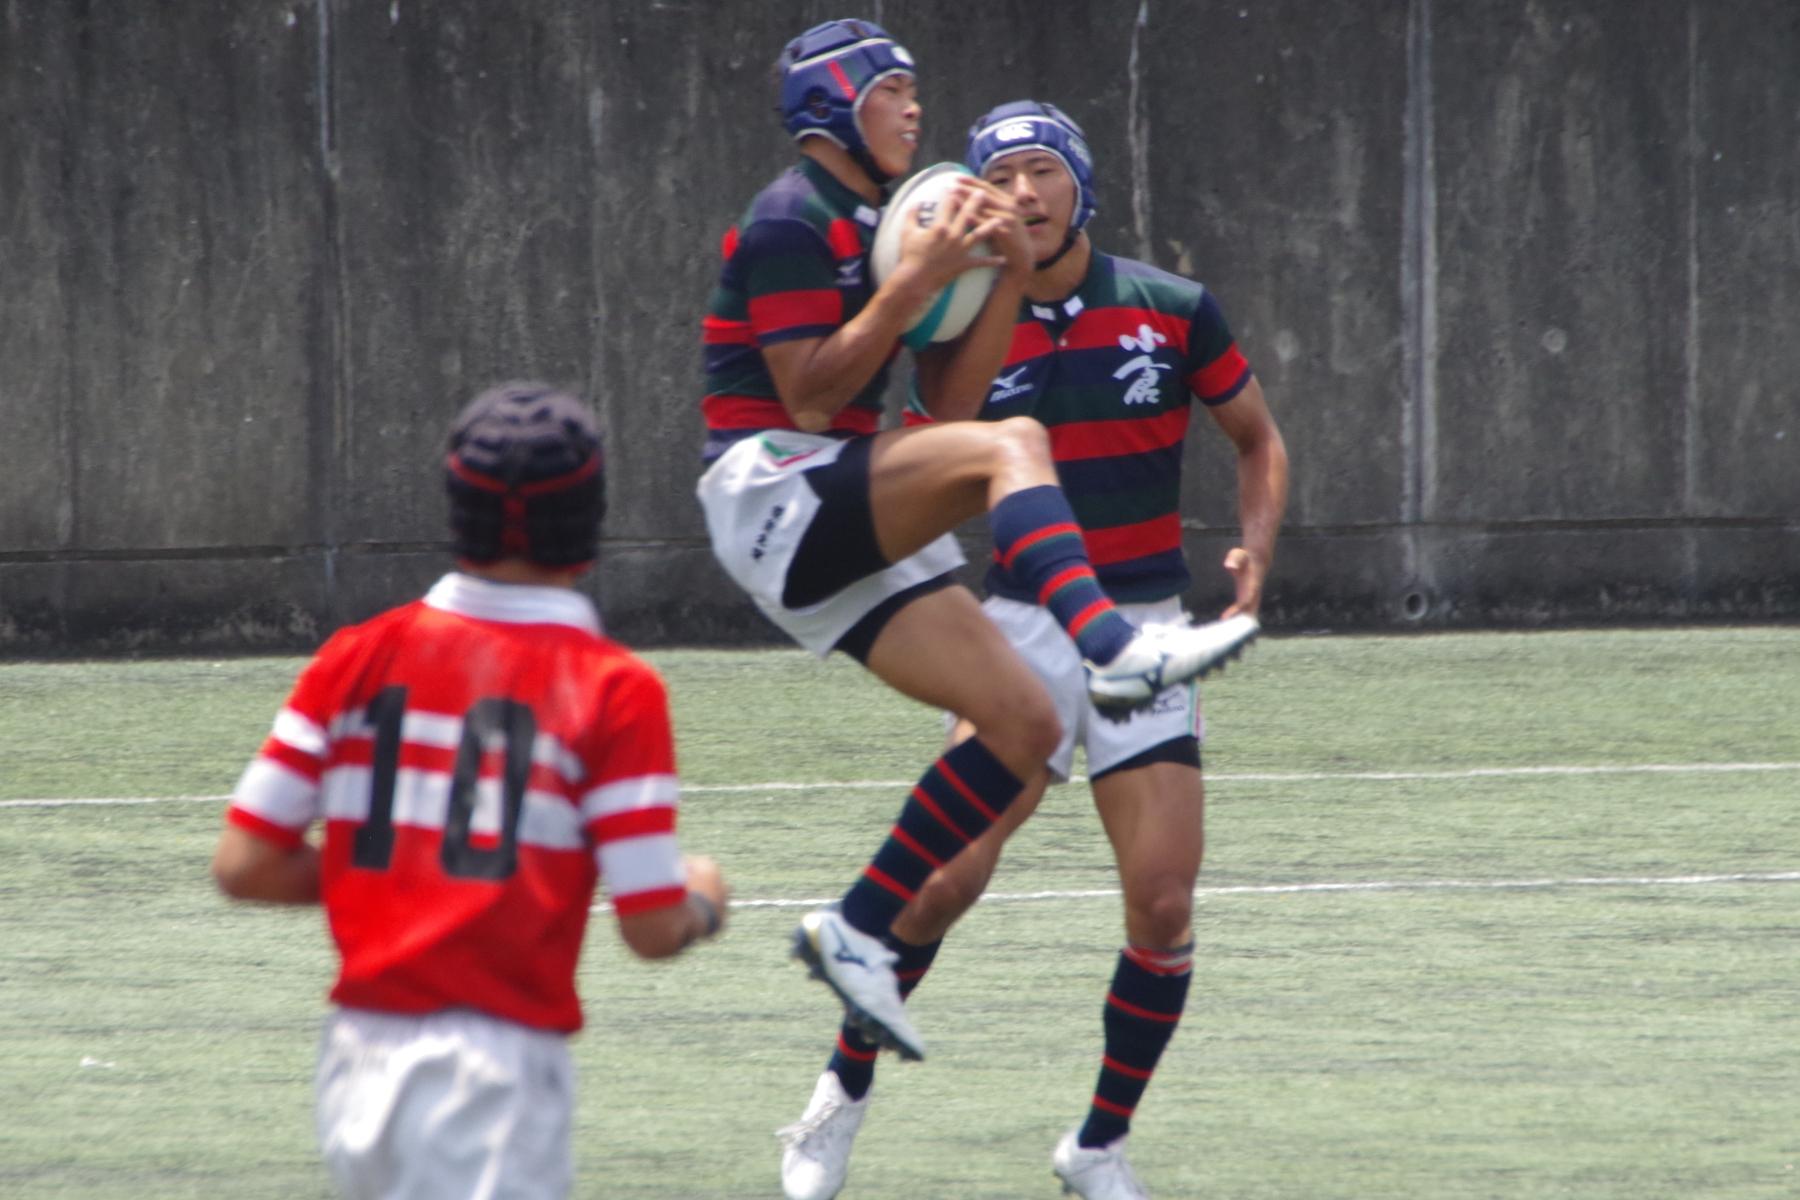 http://kokura-rugby.sakura.ne.jp/180609_131522_0663.jpg